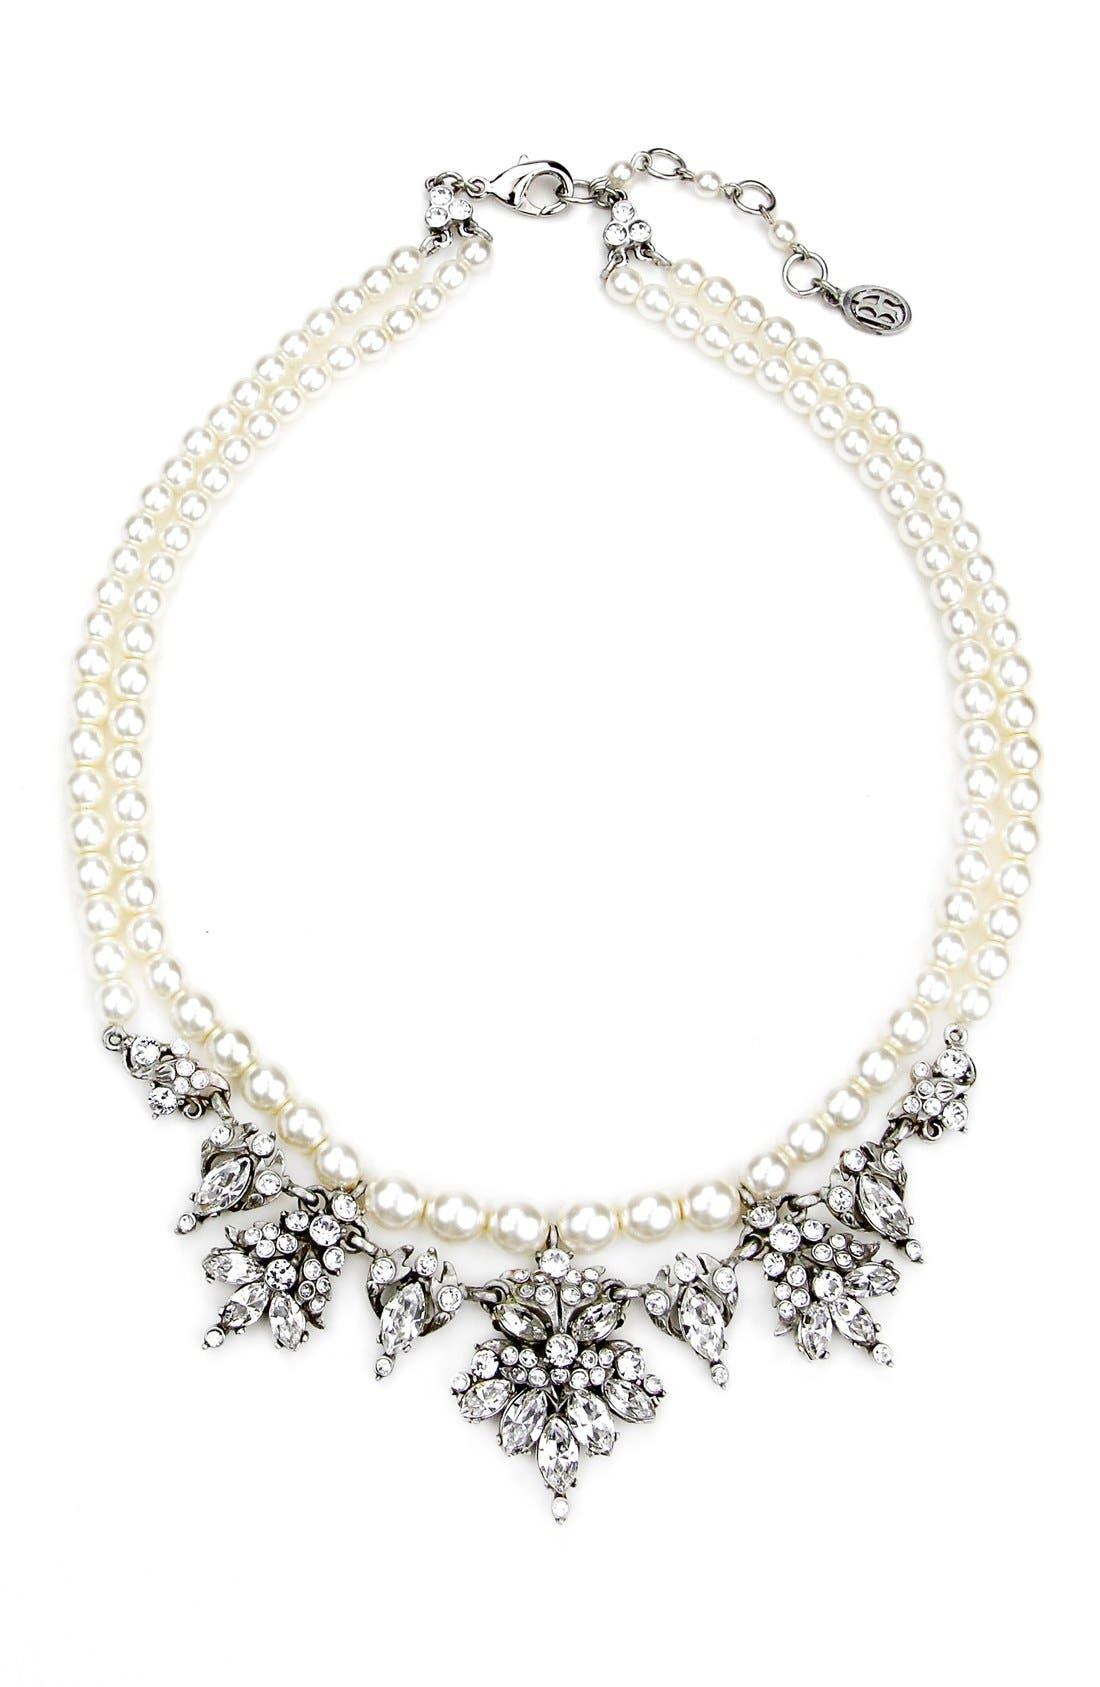 Main Image - BEN-AMUN Faux Pearl & Crystal Collar Necklace